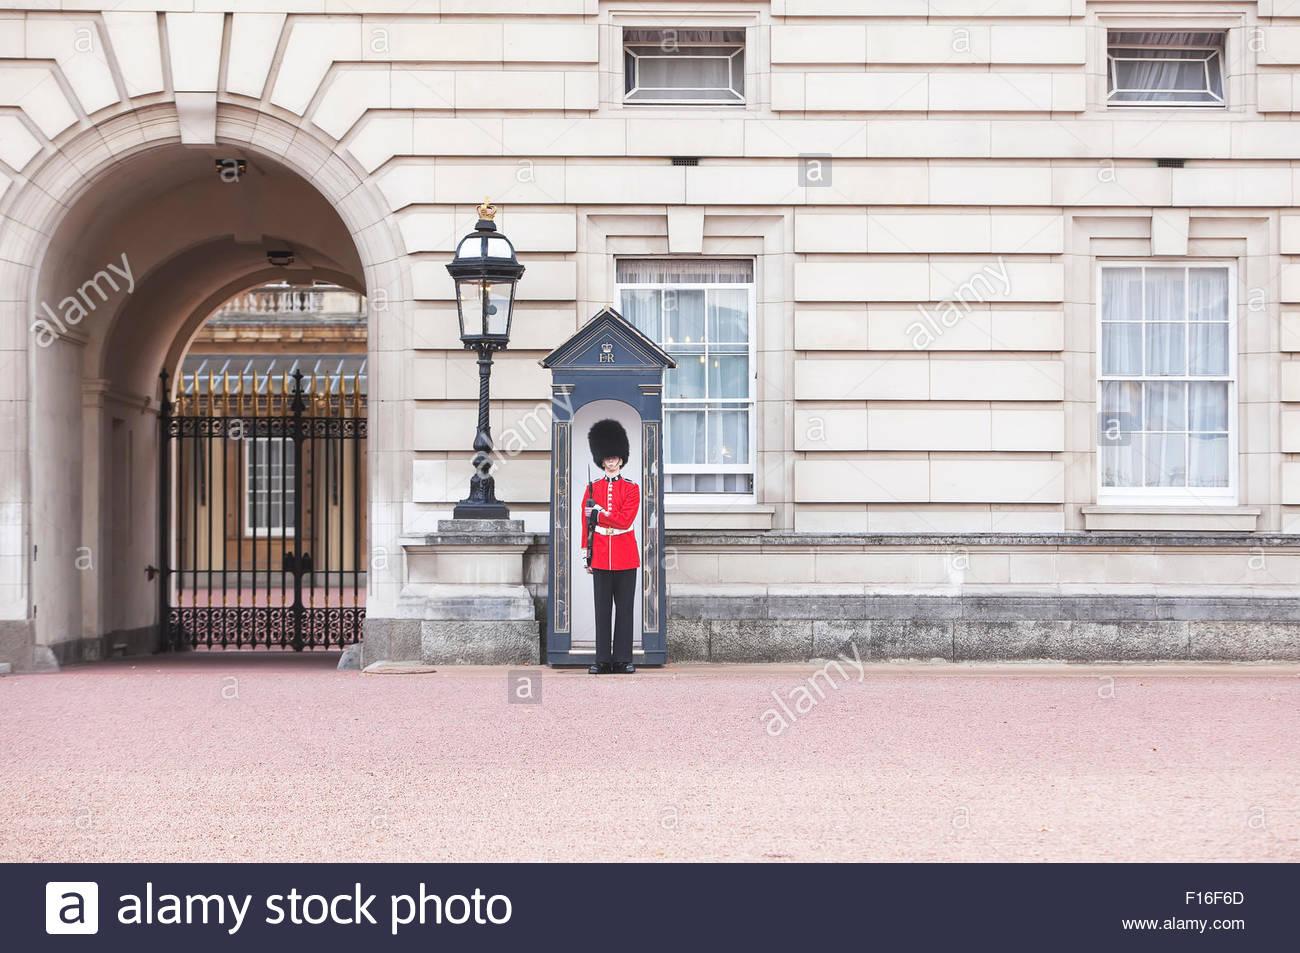 Royal Guard standing, Buckingham Palace, London, England, Great Britain, U.K, - Stock Image